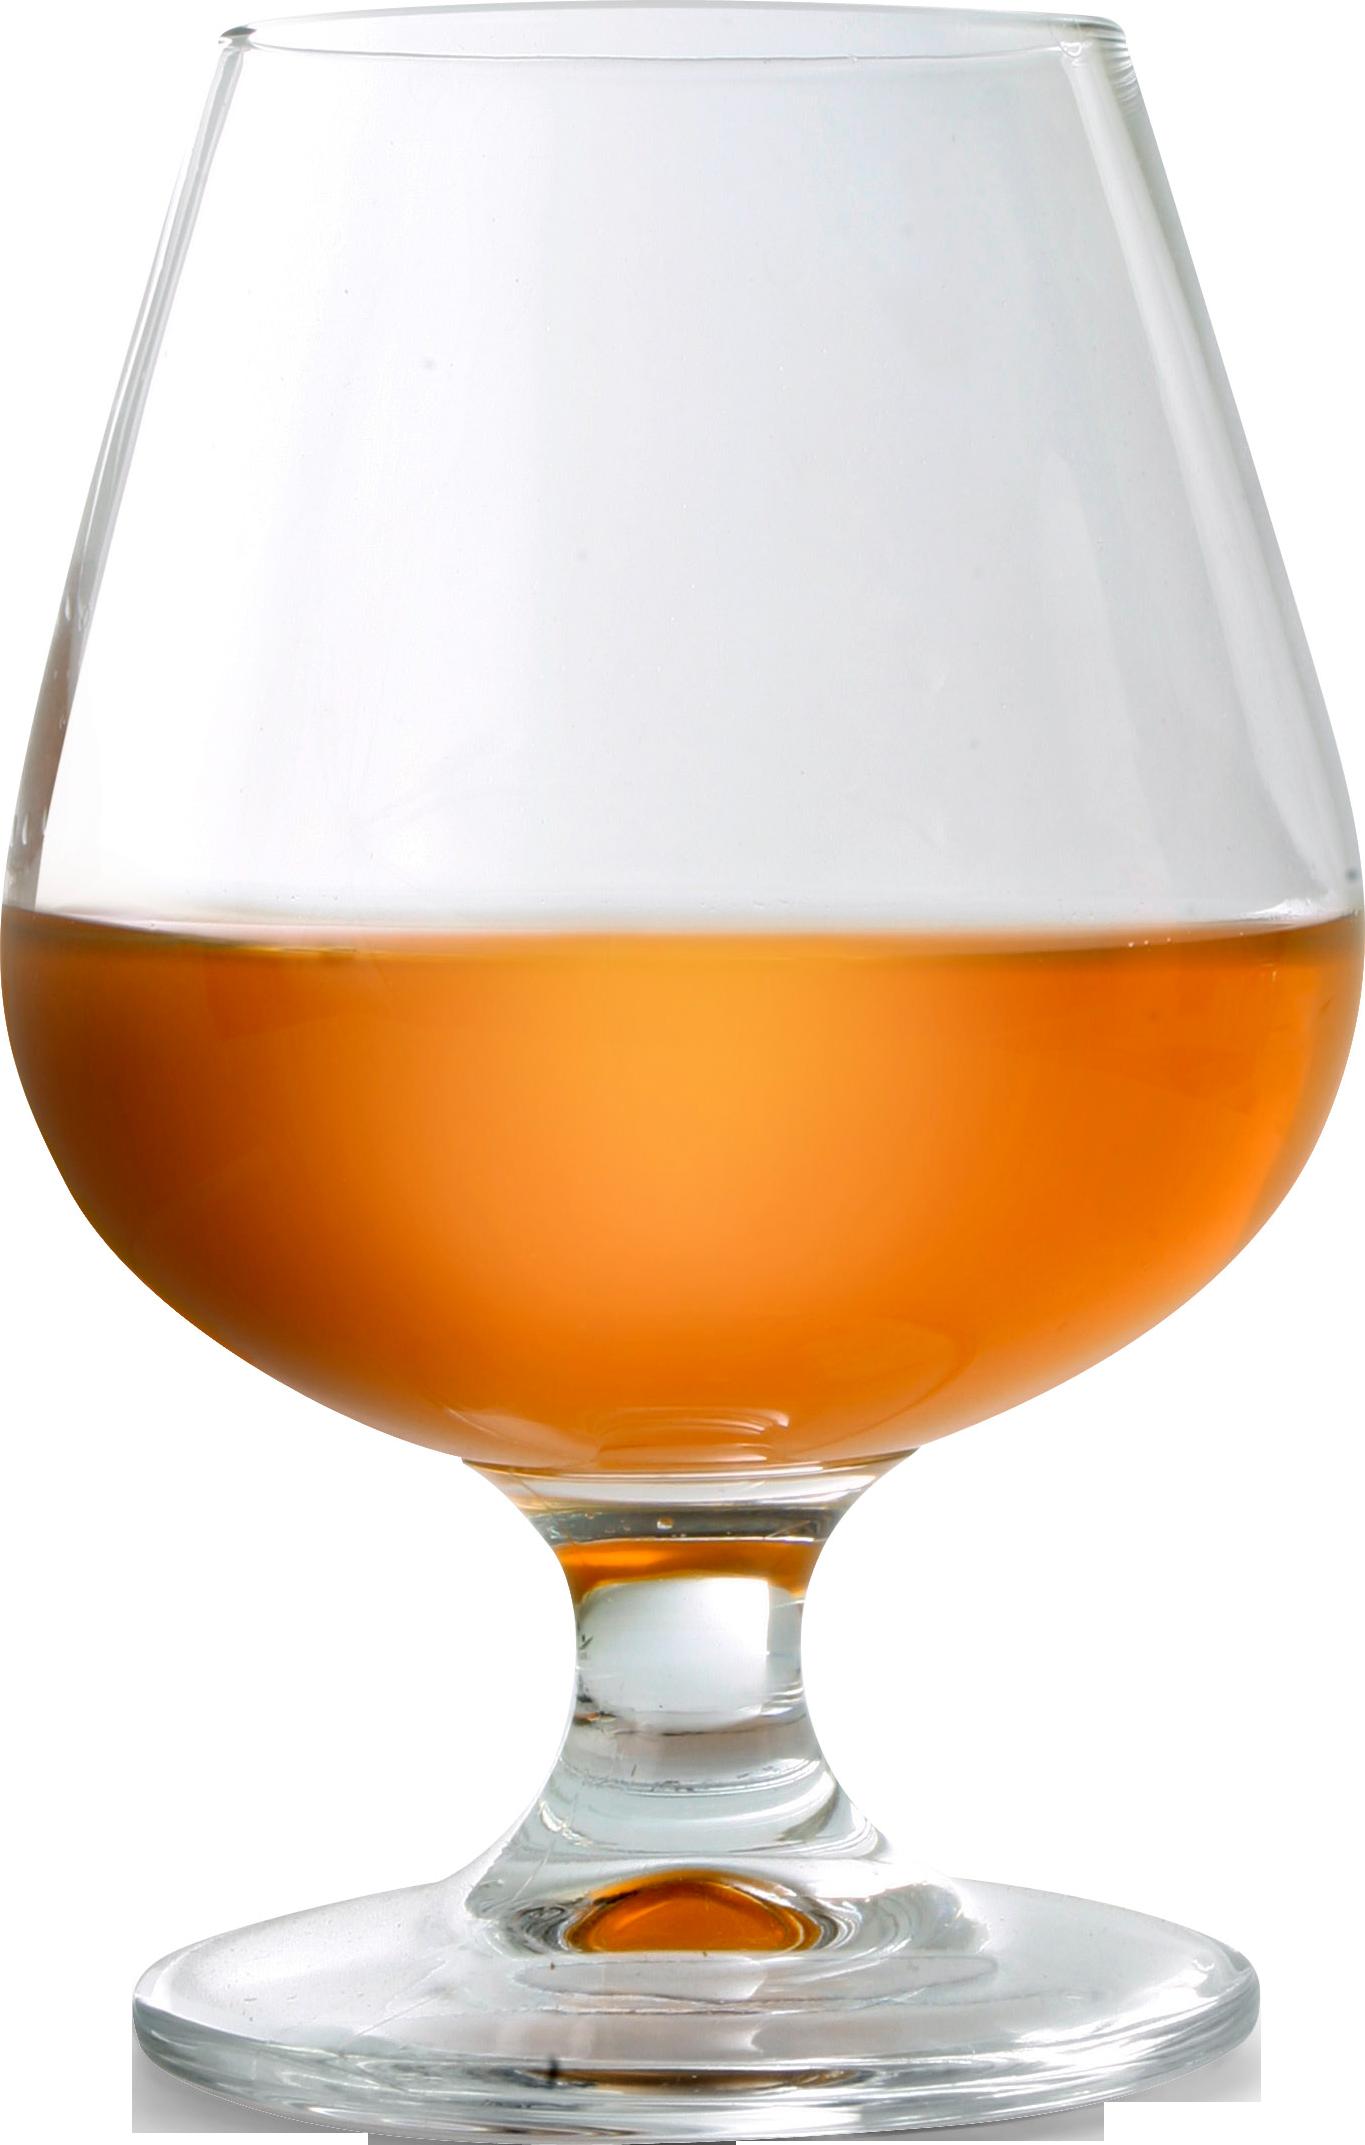 Cognac PNG Image.